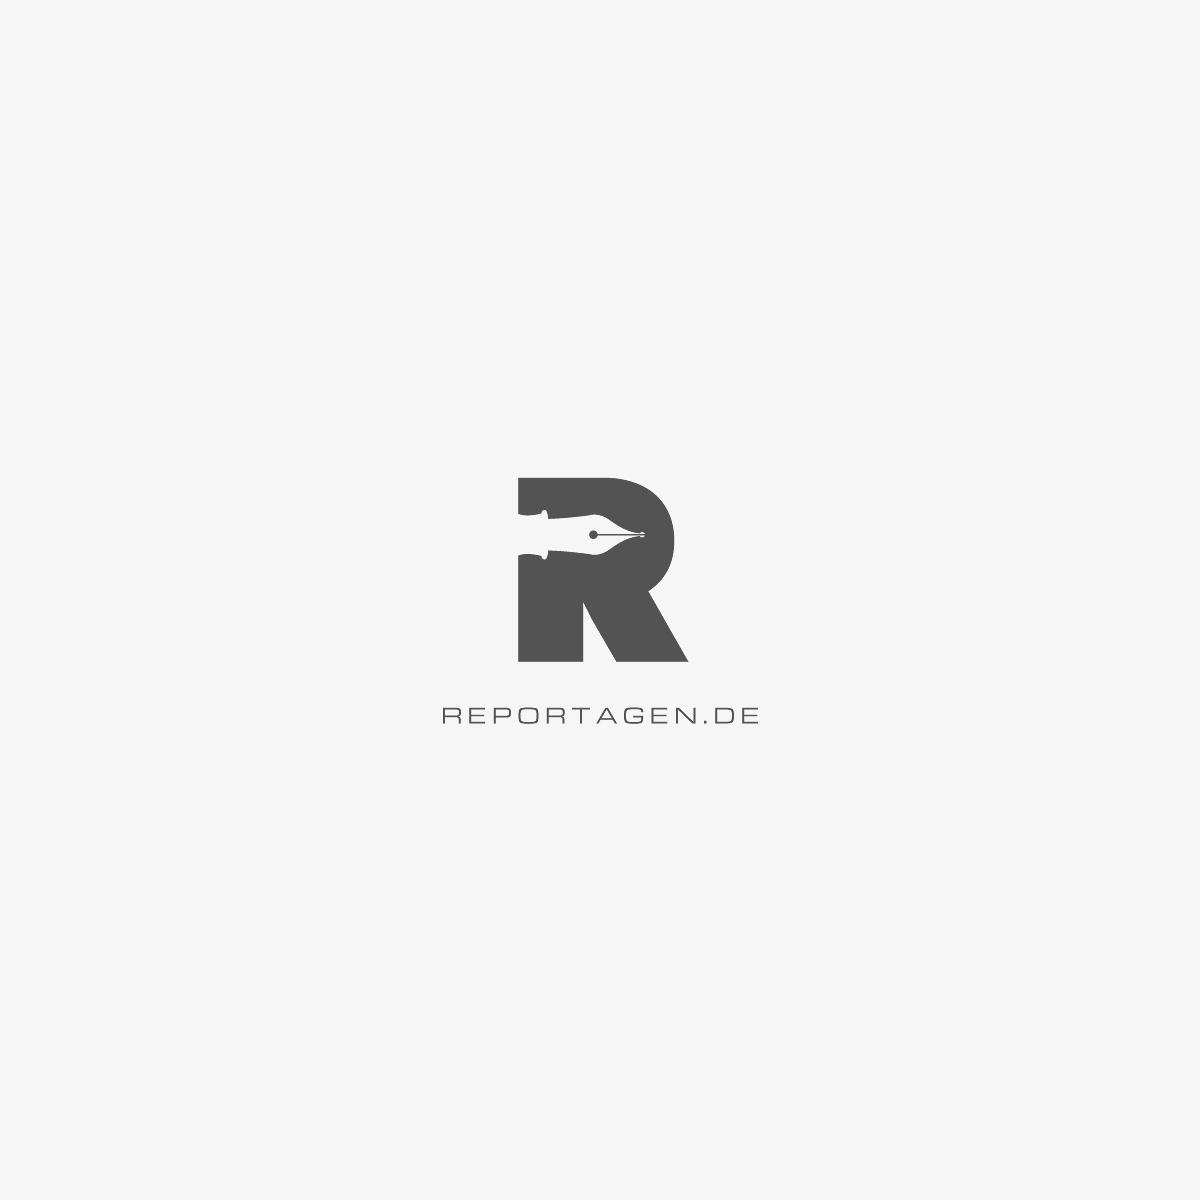 reportagen_brand_by_think